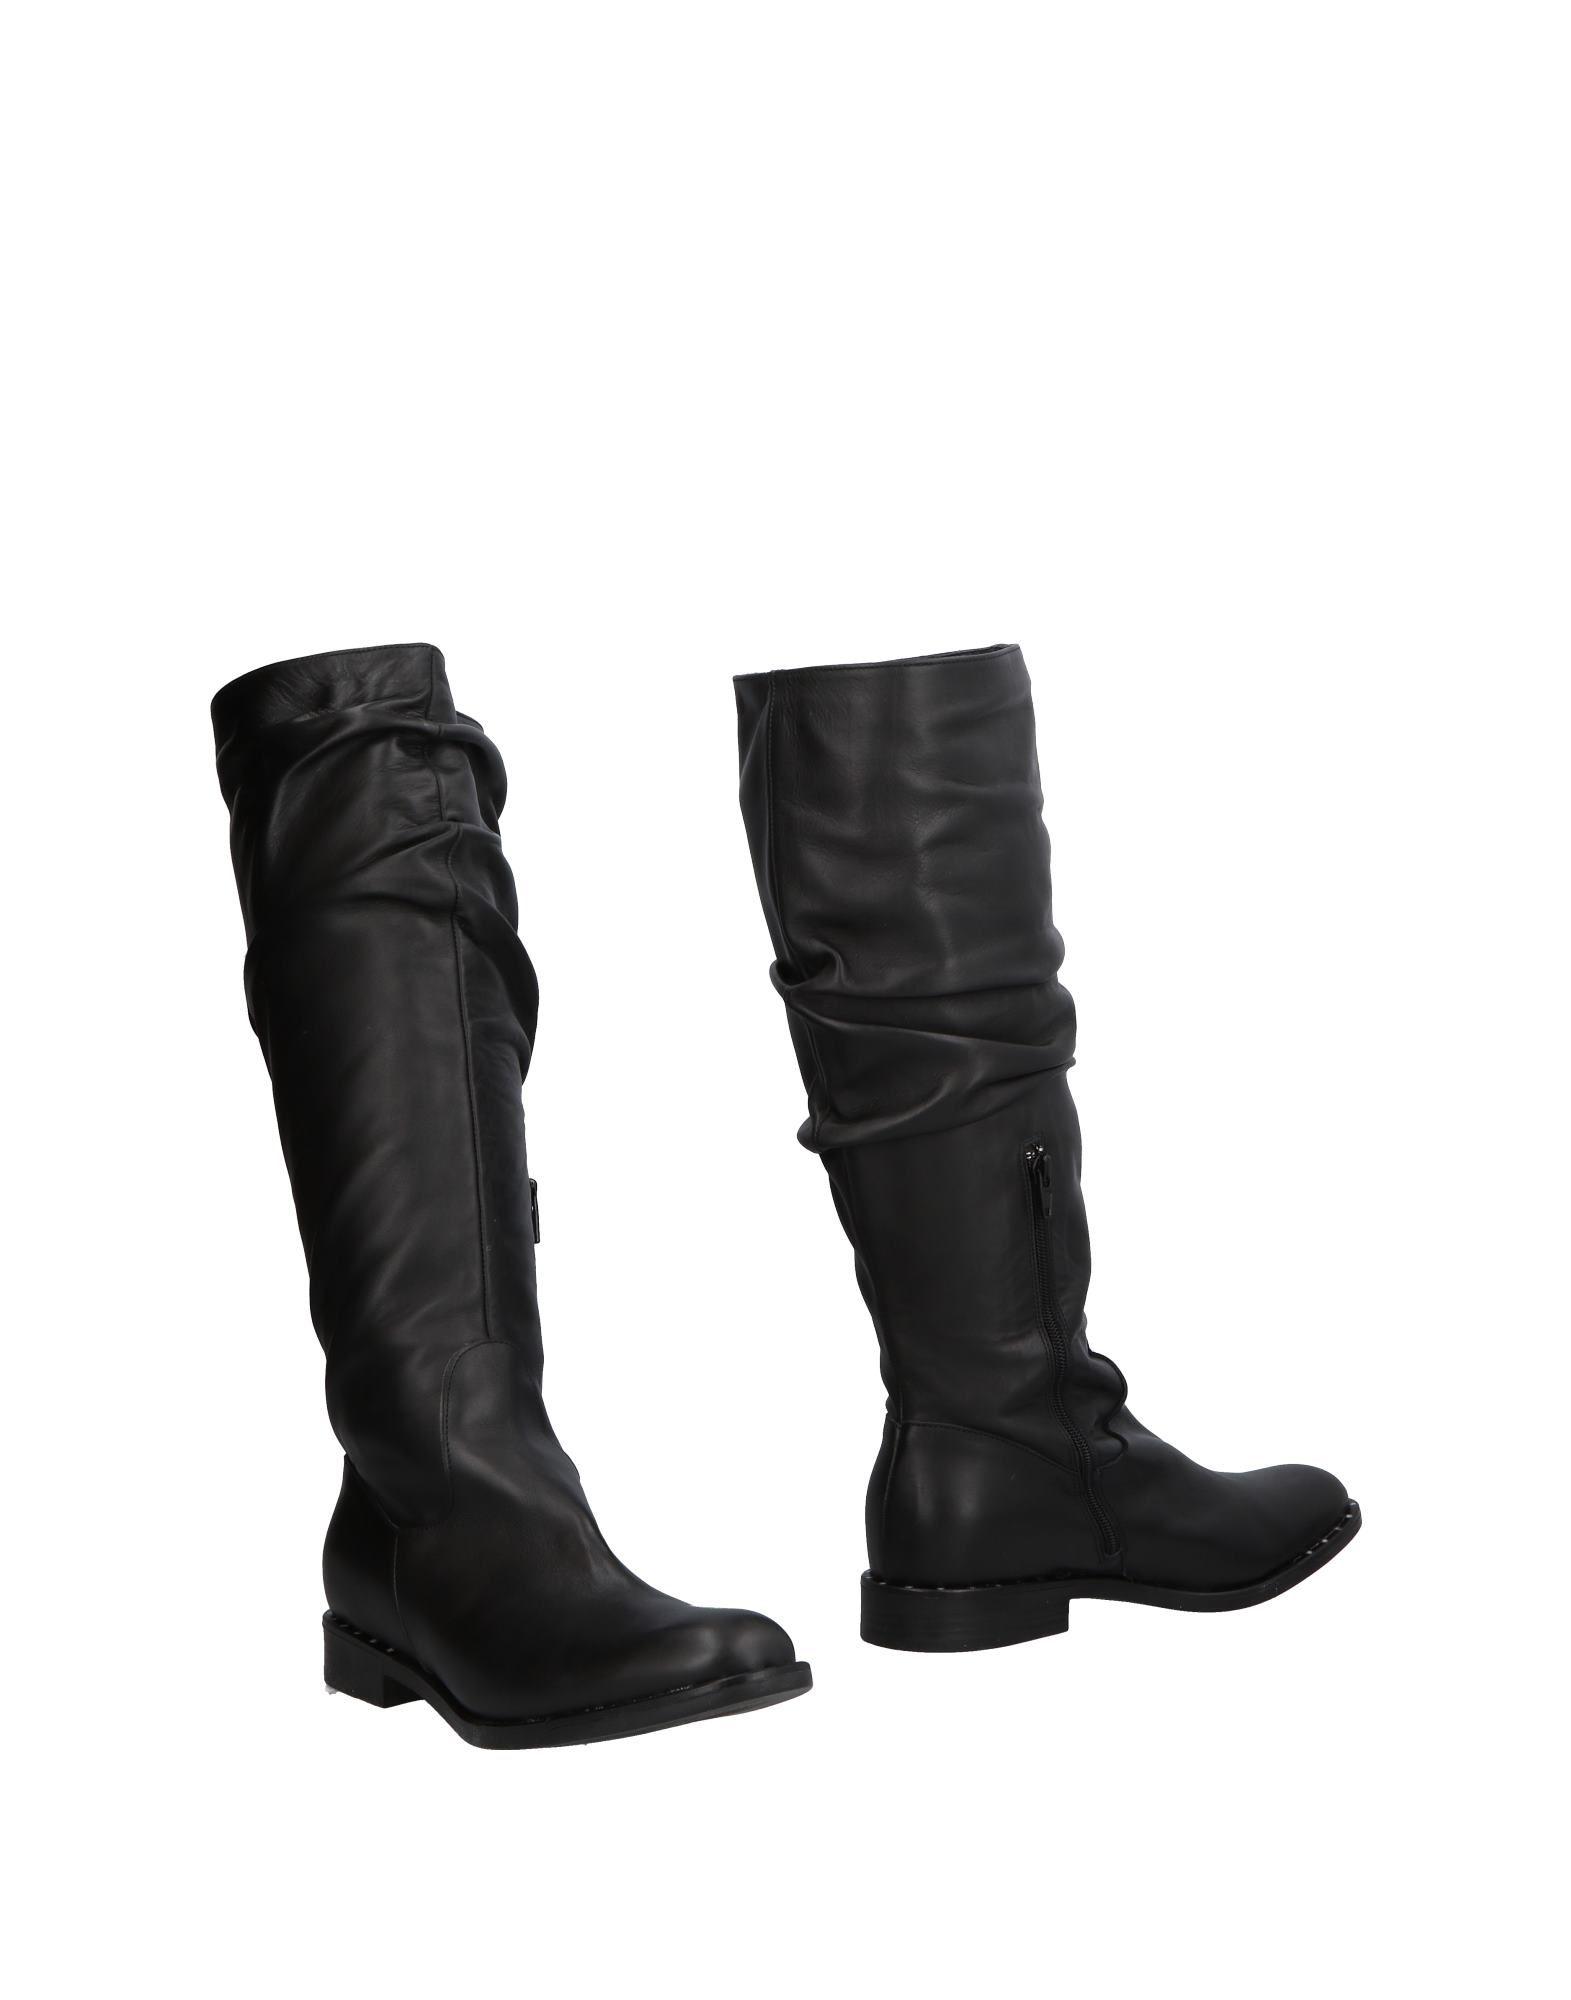 Damenschuhe Stiefel Più Stiefel Damenschuhe Damen 11504690EO Gute Qualität beliebte Schuhe 45d2c6